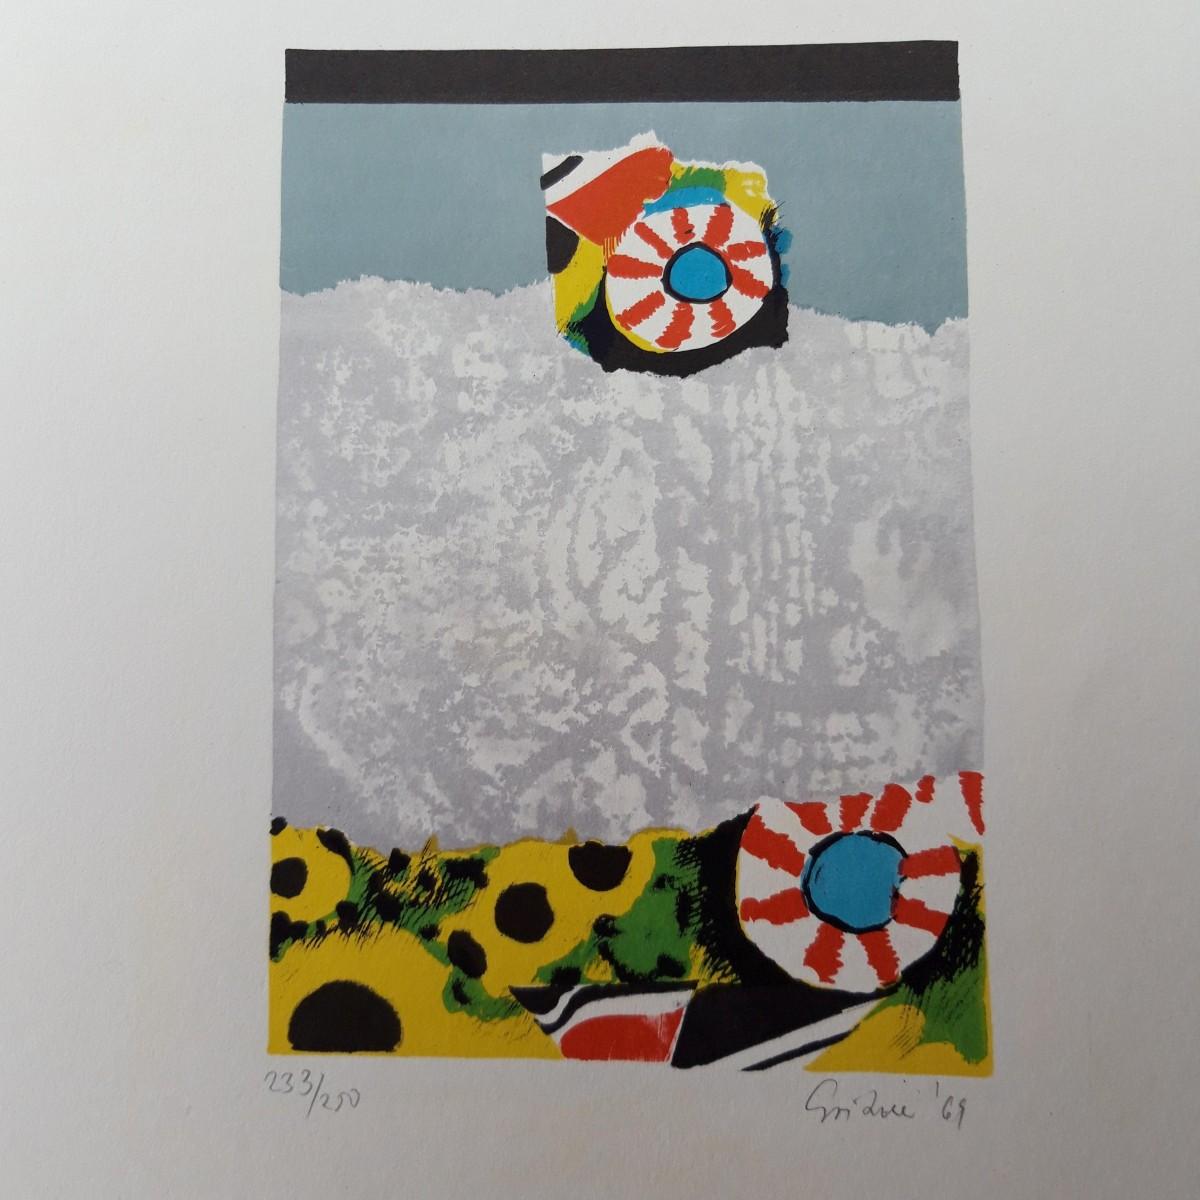 Günter Gritzner - 'Vinci-Mappe' mit 10 Lithographien, 1968 kopen? Bied vanaf 295!